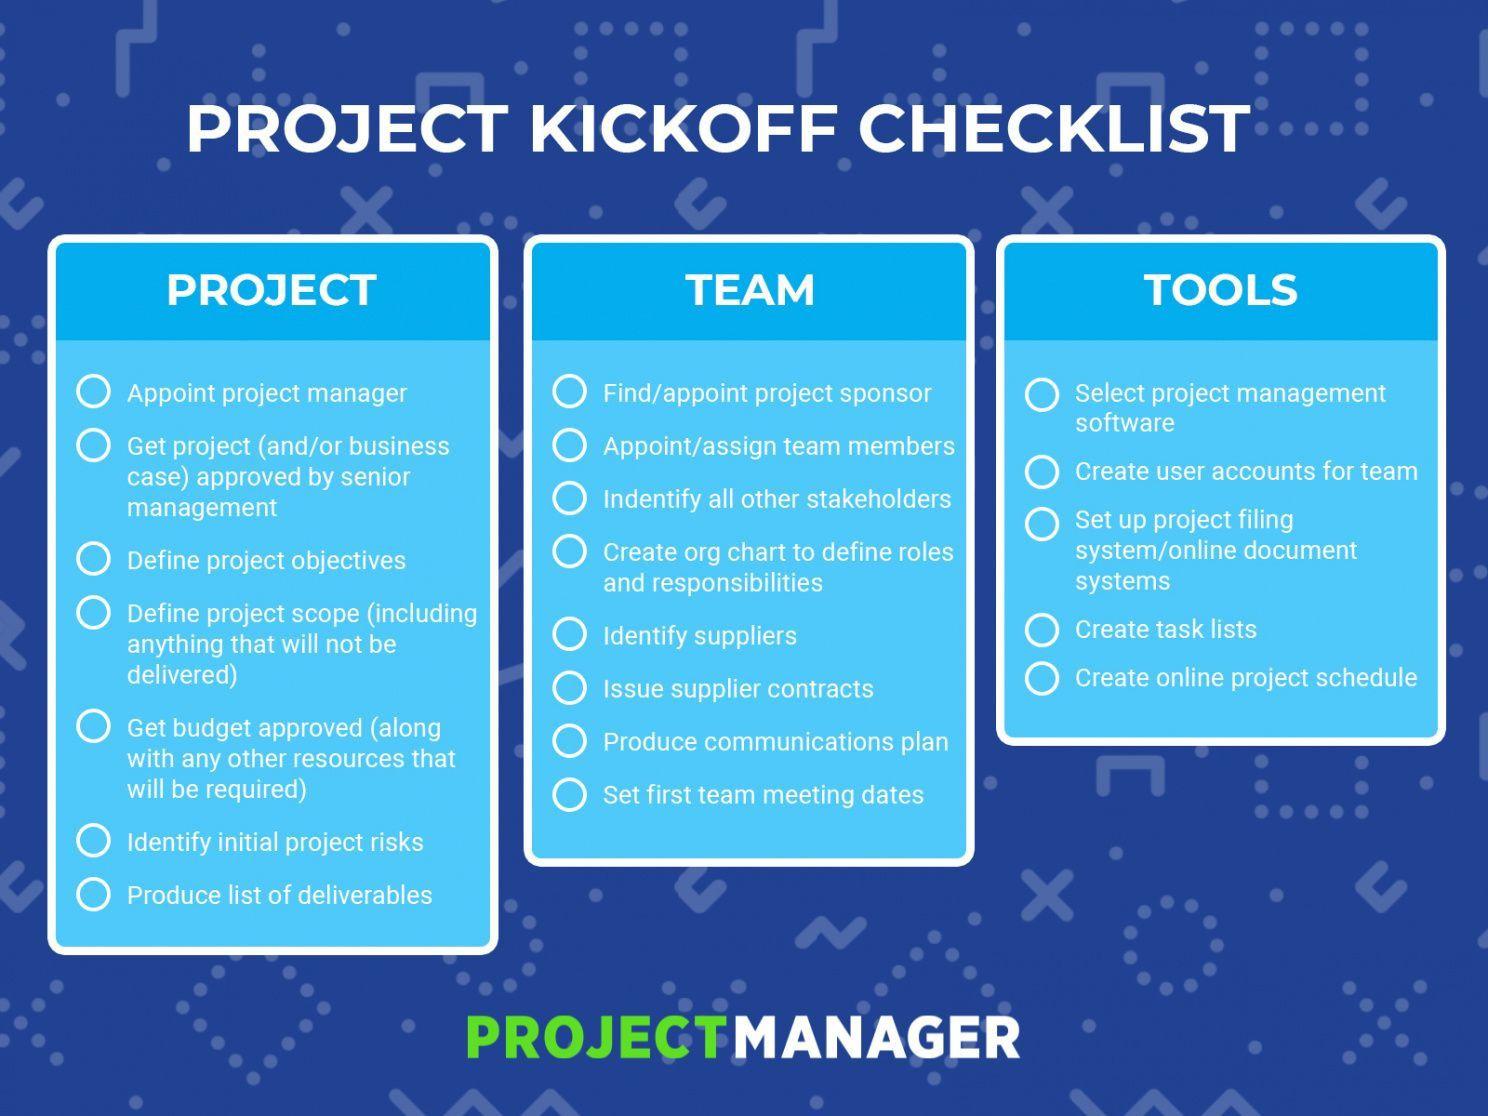 006 Striking Project Management Kick Off Meeting Agenda Template Sample  KickoffFull